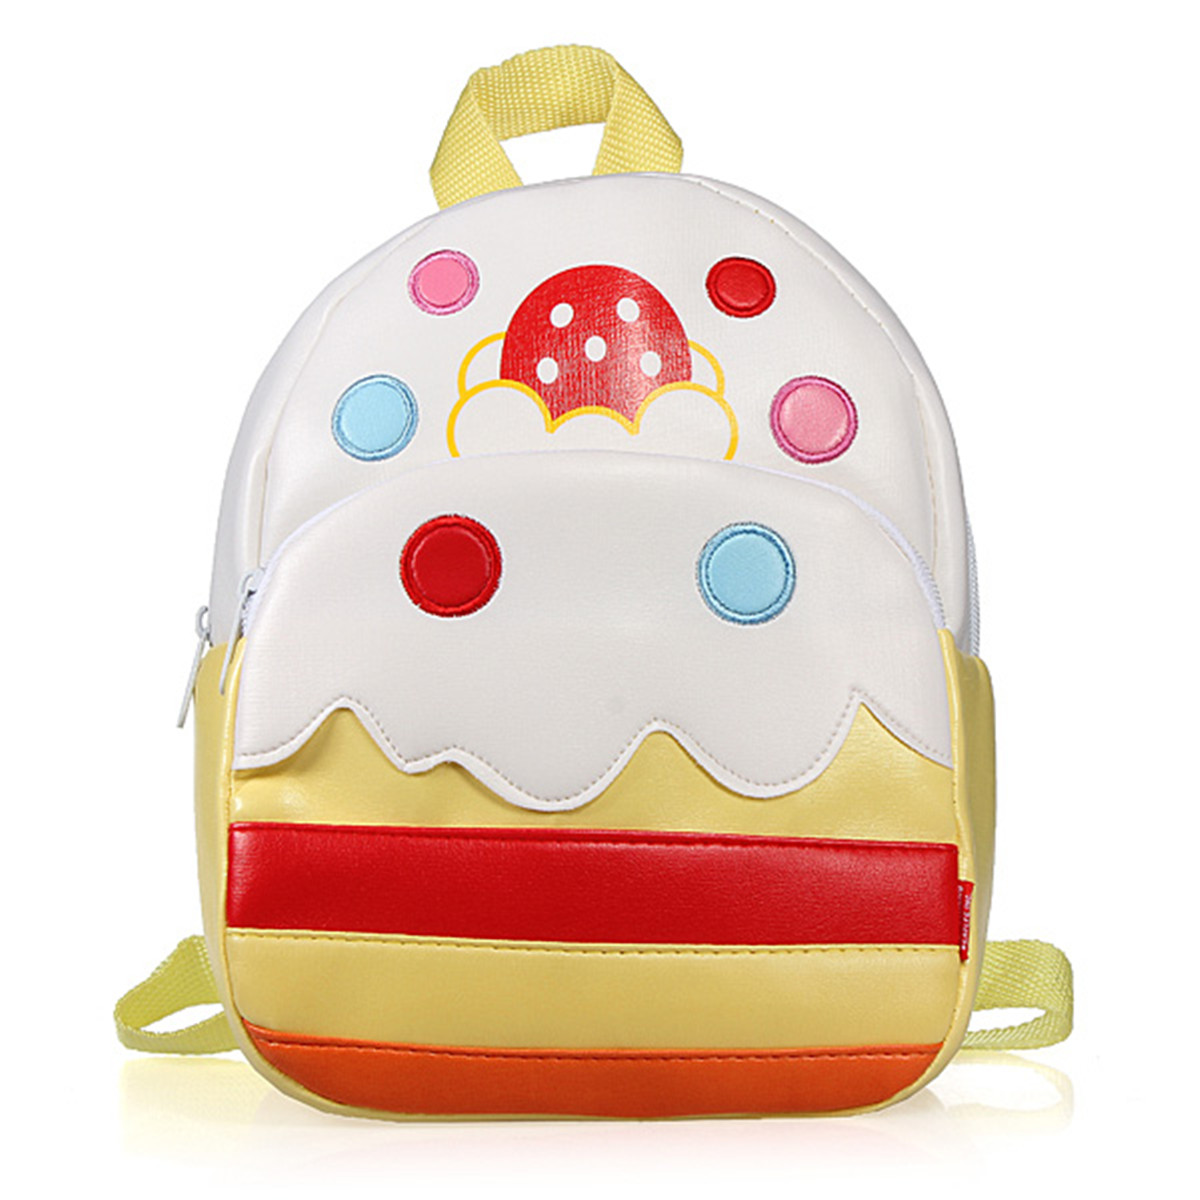 Baby Animal Schoolbag Kid Child Cute Cartoon Backpack Shoulder Backpack Gift